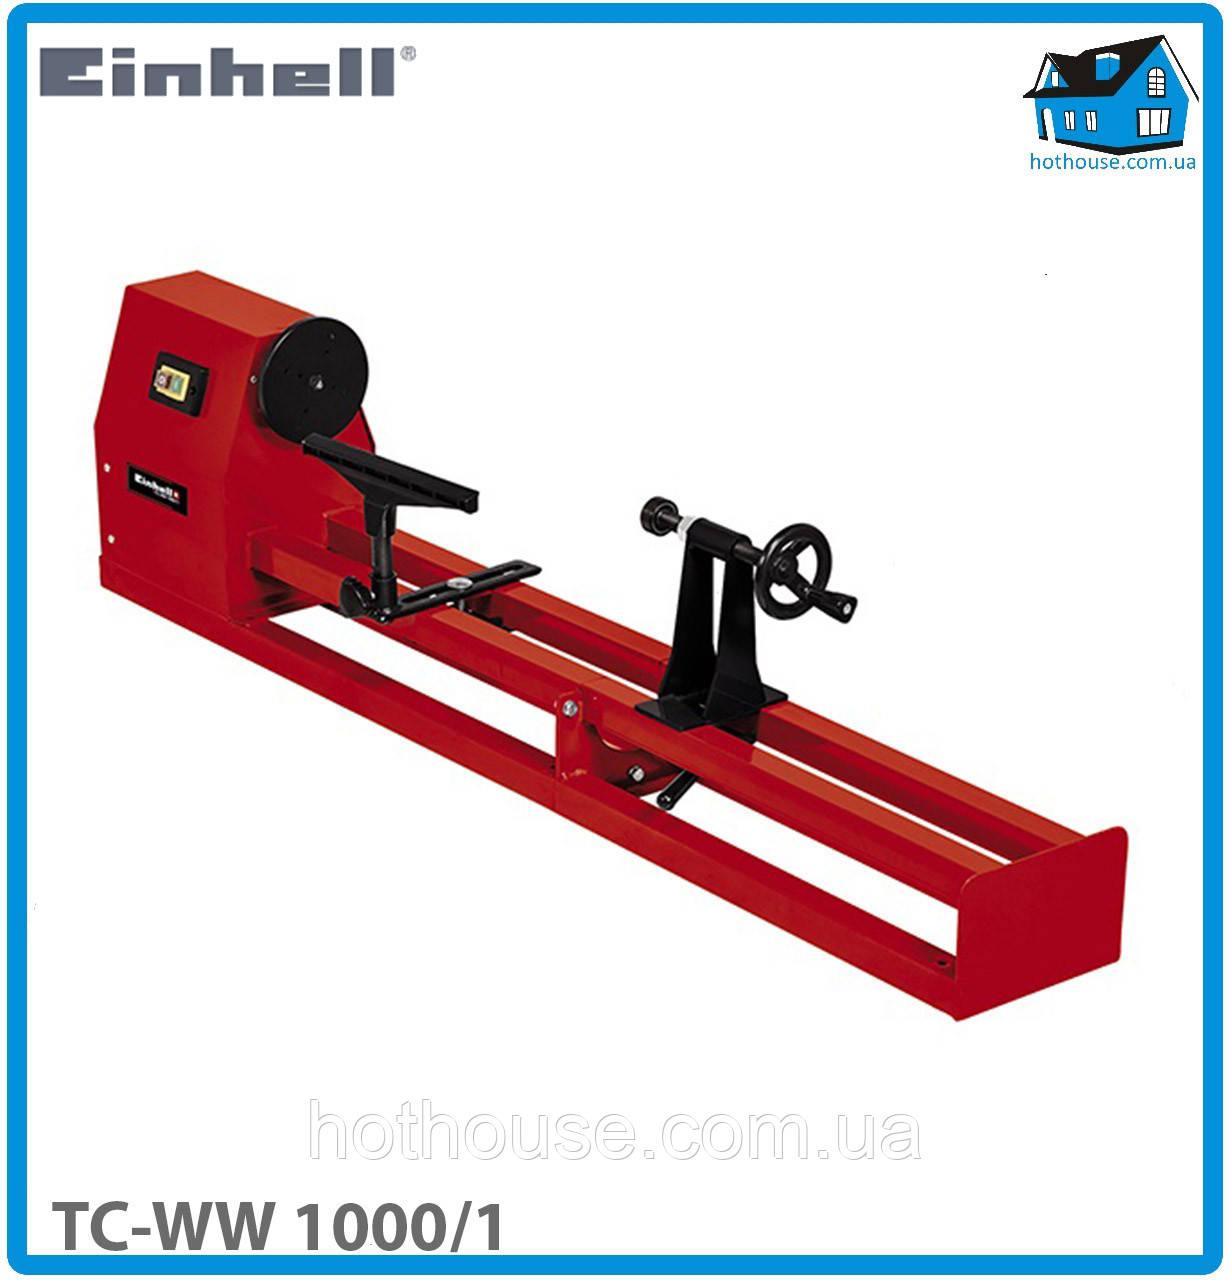 Токарный станок по дереву Einhell TC-WW 1000/1